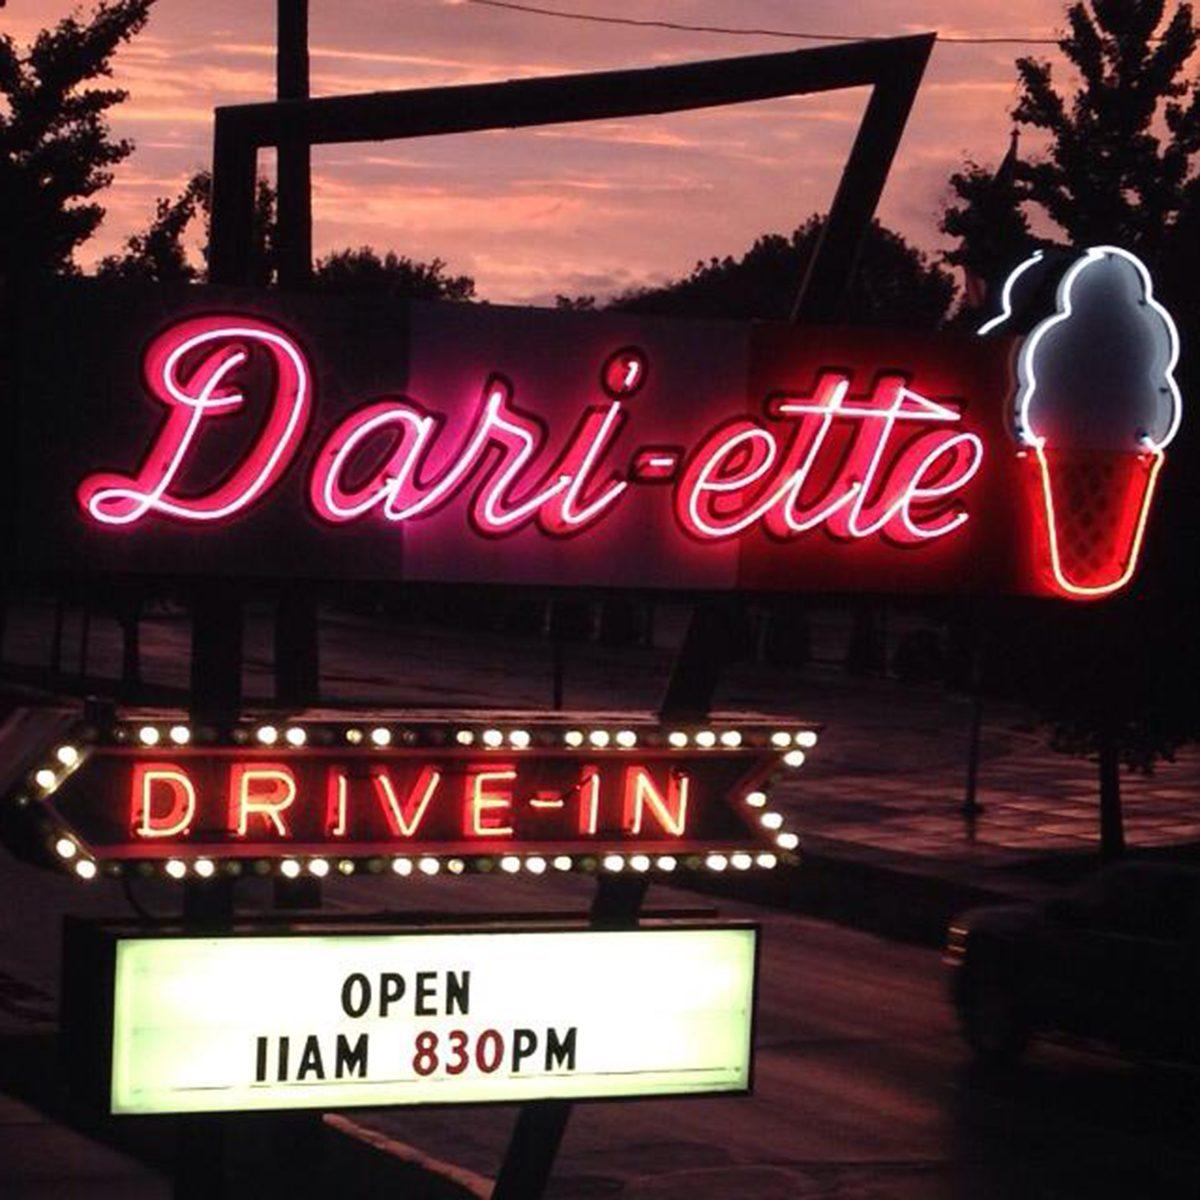 DARI-ETTE DRIVE-IN